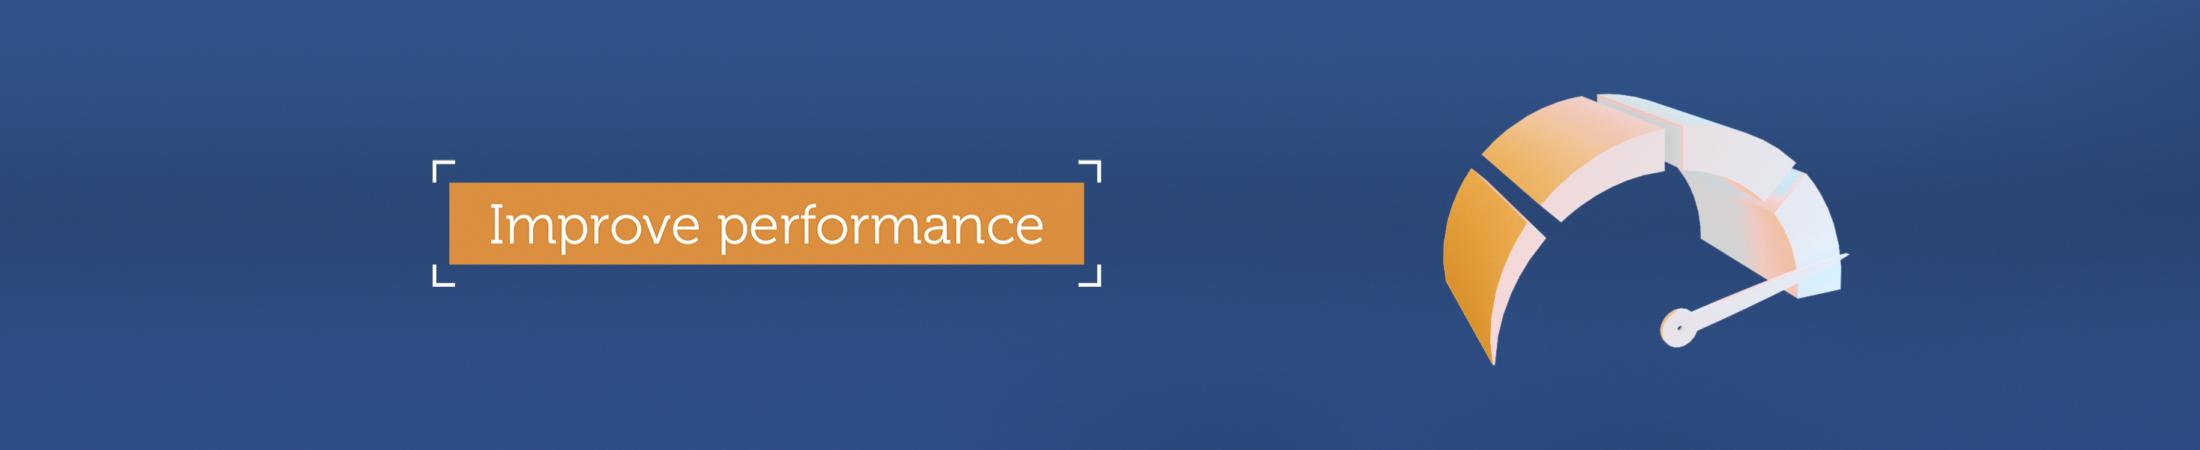 Improve performance - mobilebanner